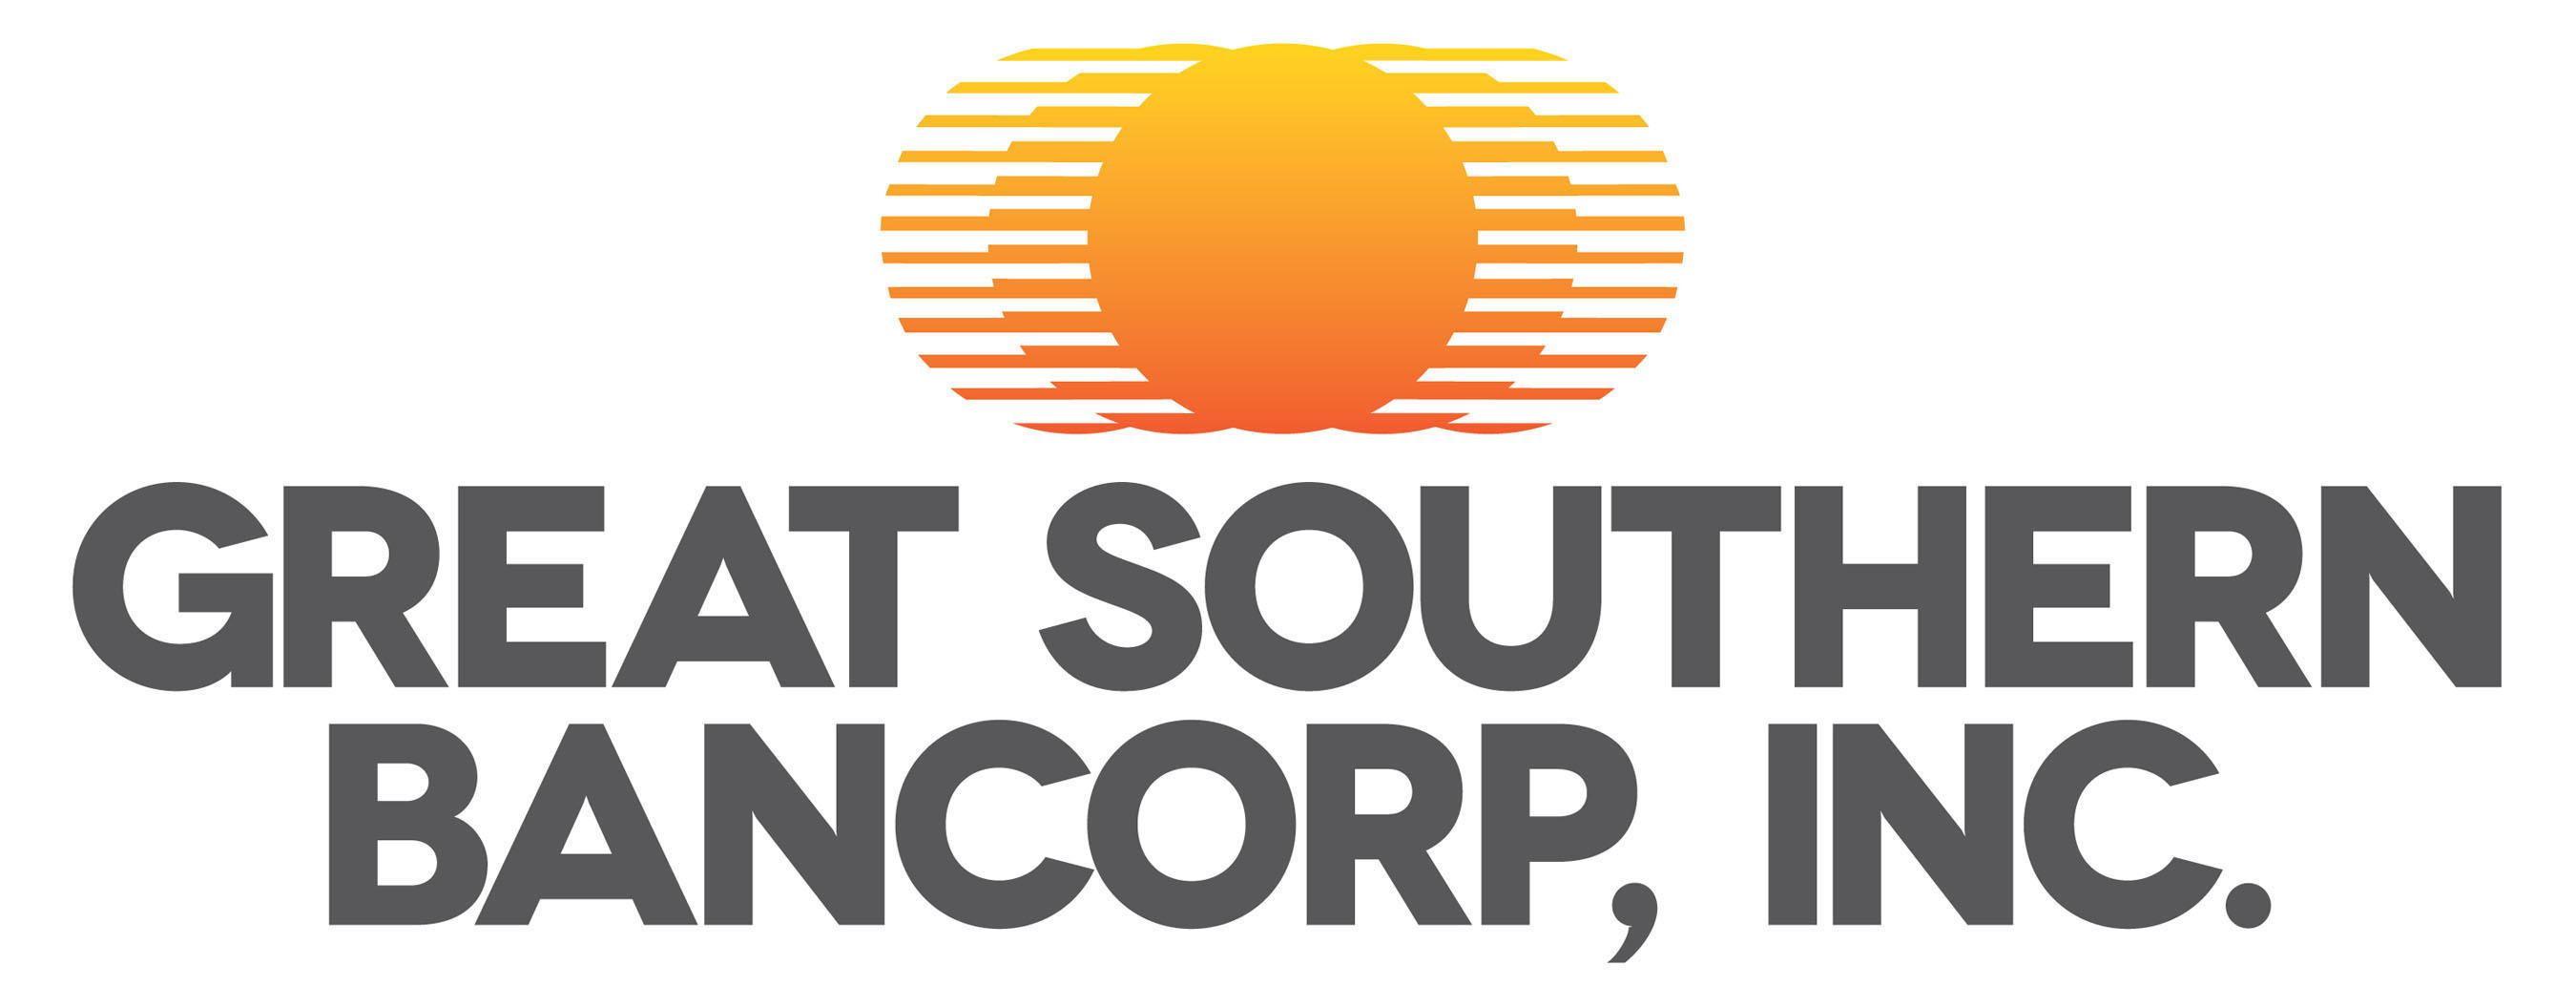 Great Southern Bancorp logo.